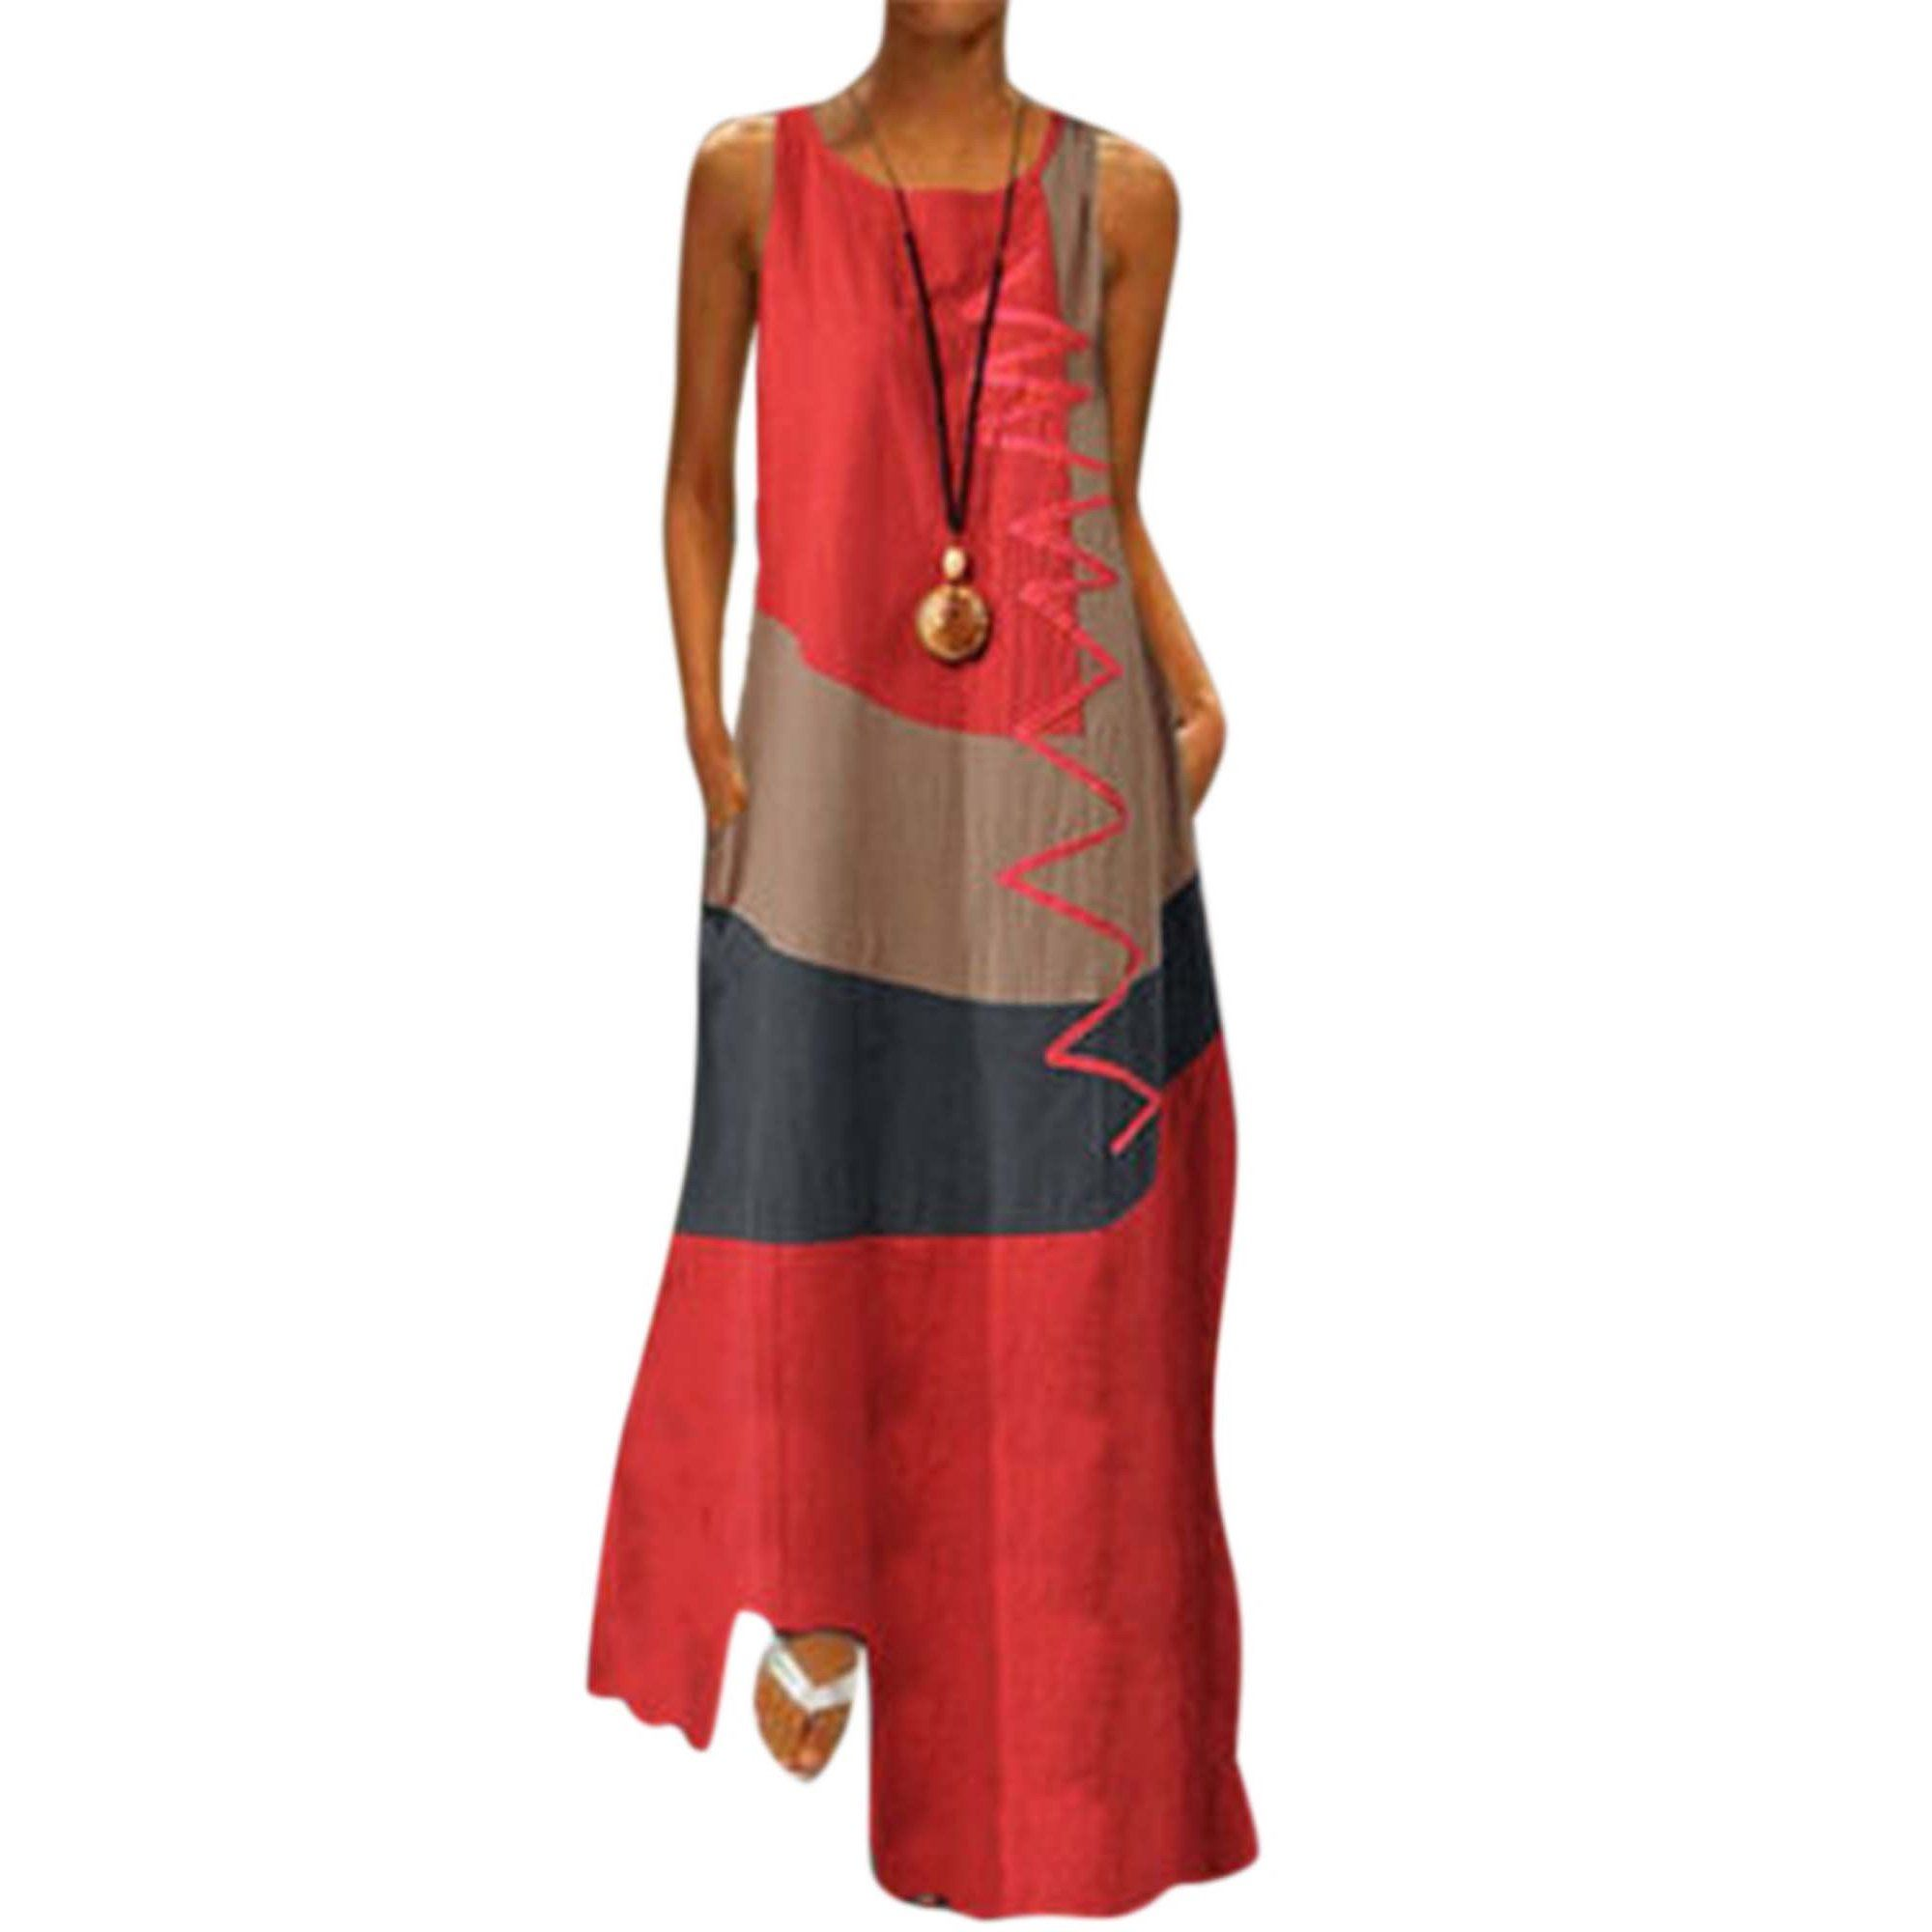 Lallc Women S Vintage Sleeveless Beach Maxi Dresses Plus Size Summer Loose Sundress Walmart Com Plus Size Maxi Dresses Beach Maxi Dress Womens Dress Coats [ 2000 x 2000 Pixel ]